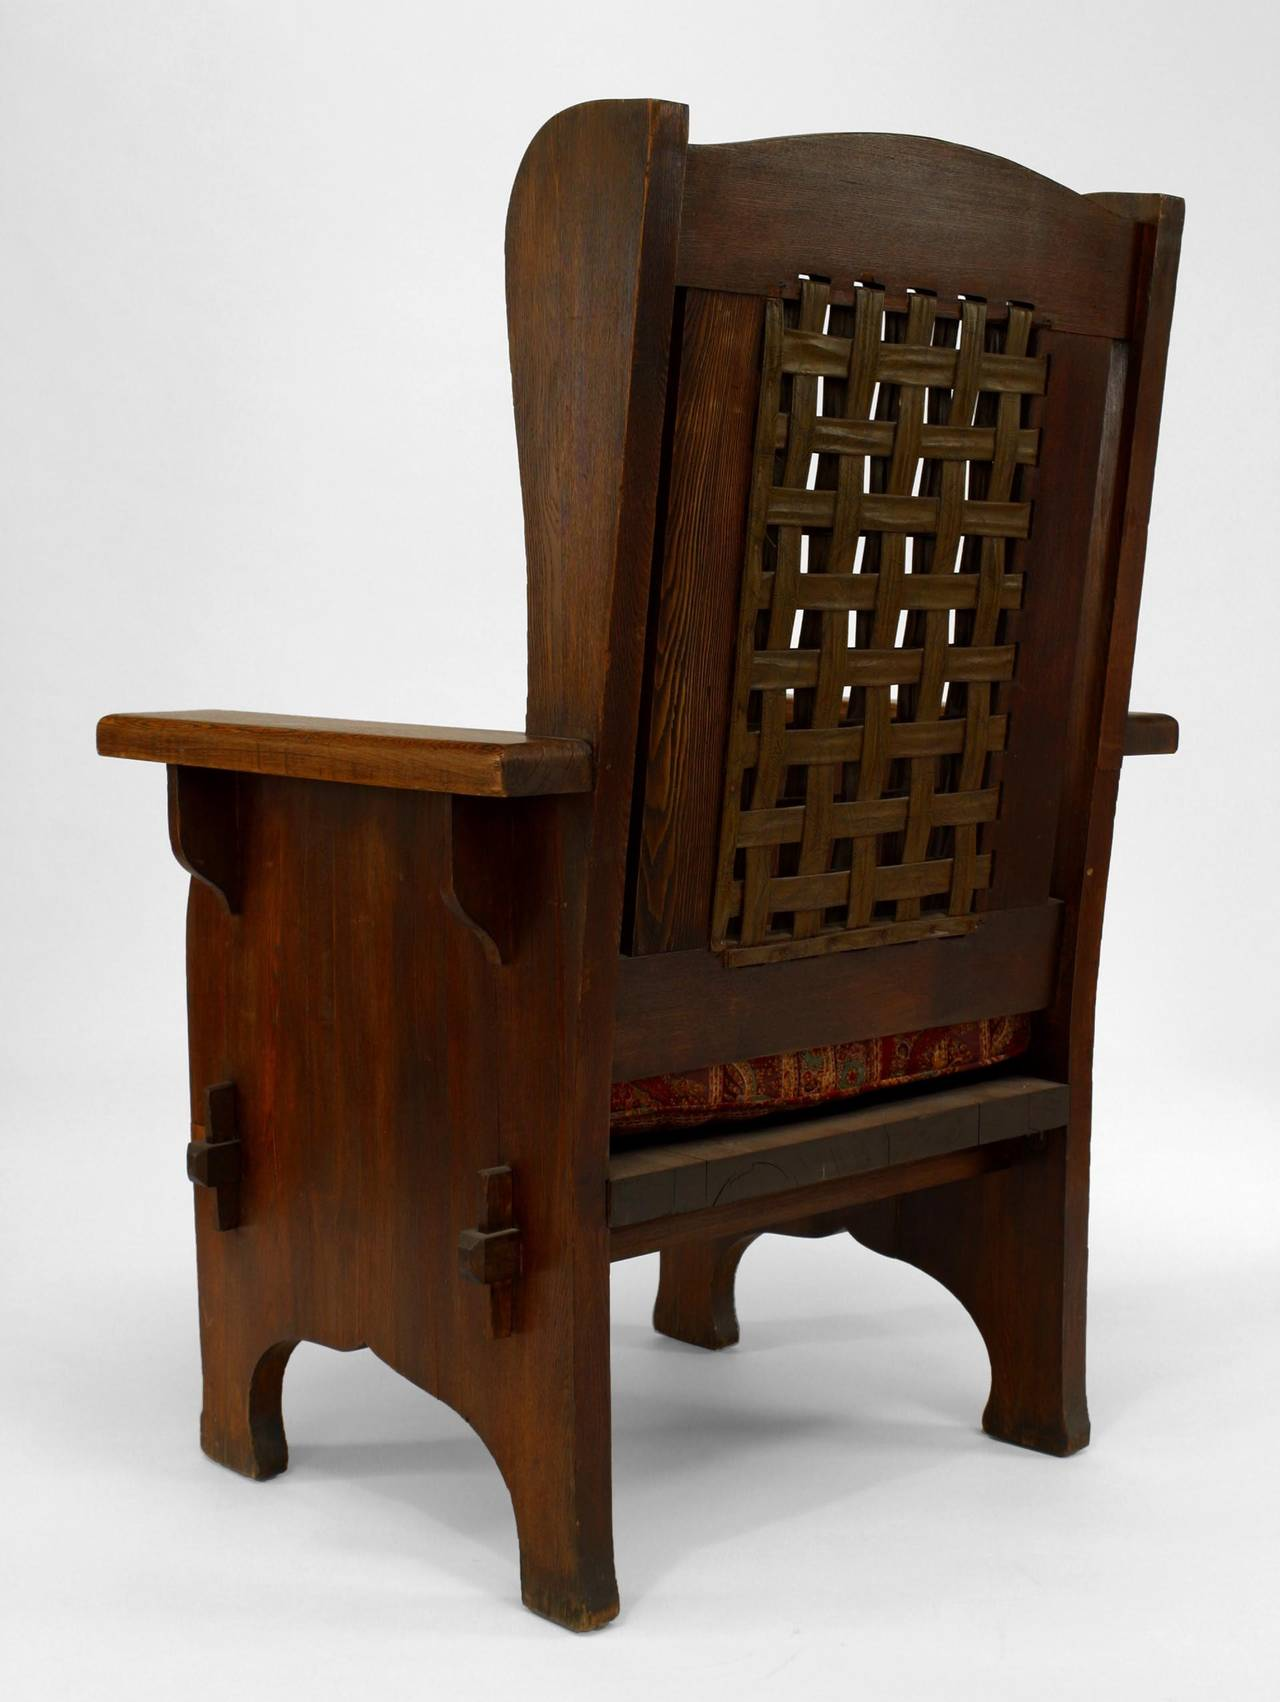 Dexter Furniture Osetacouleur